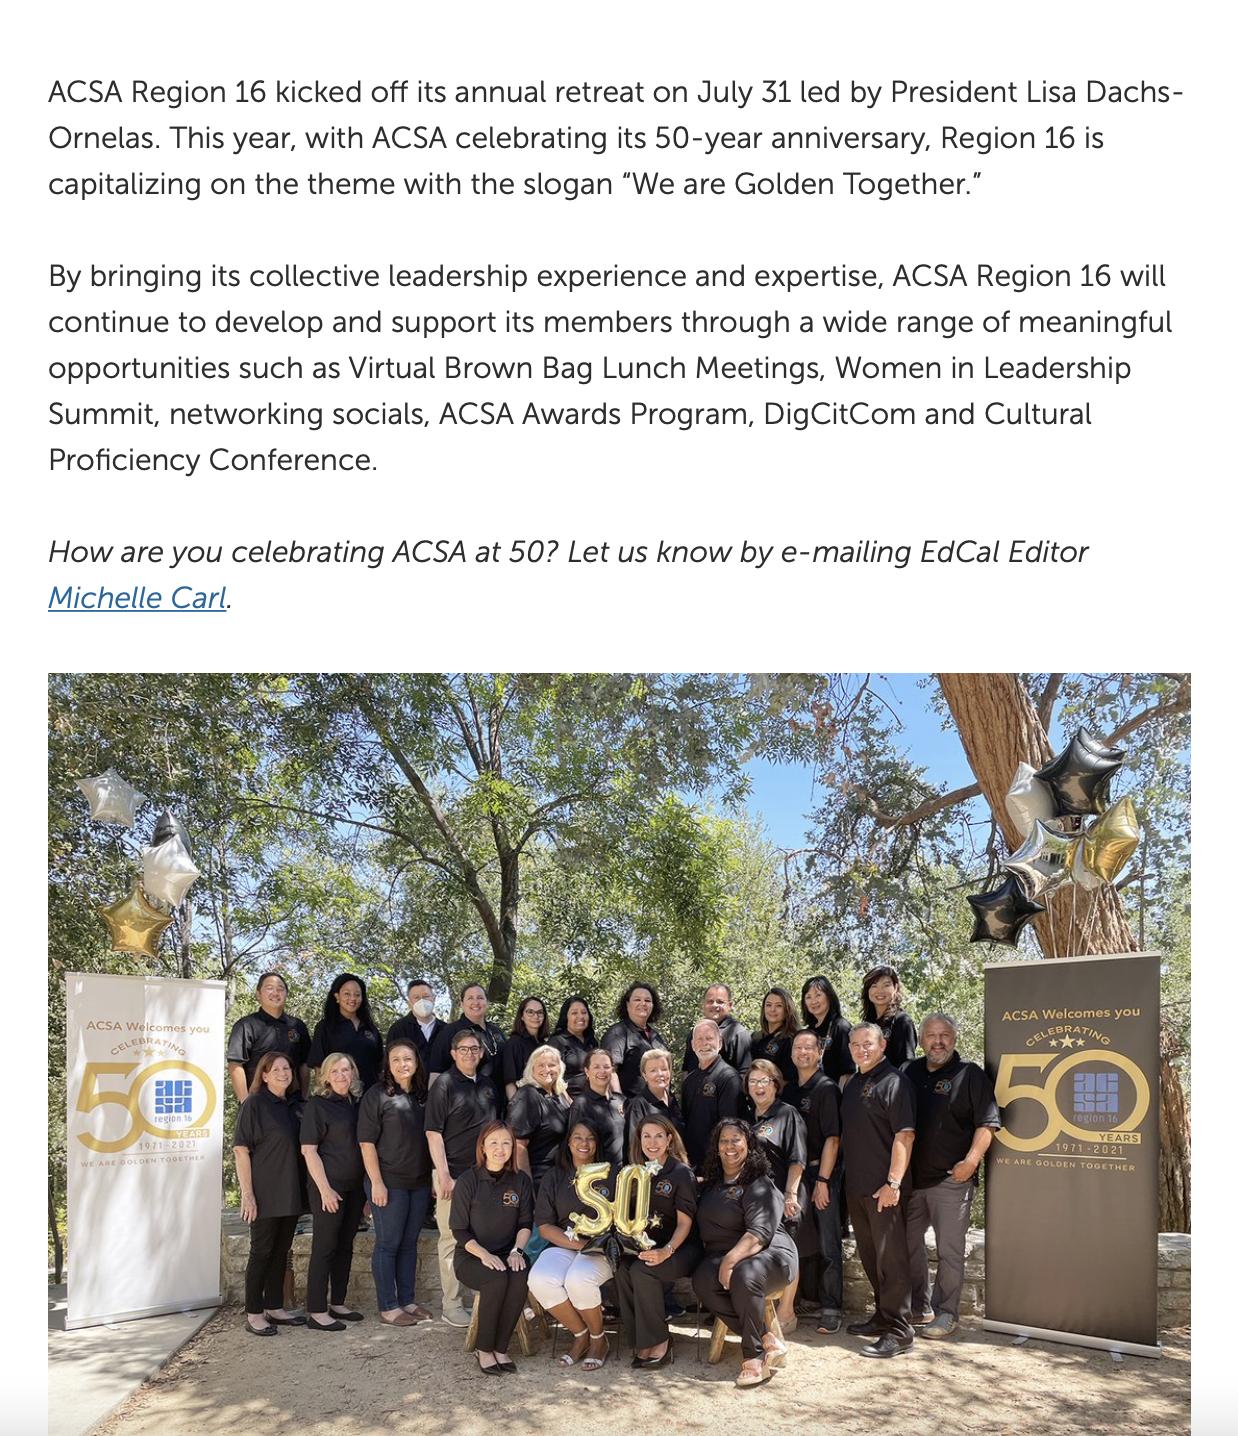 https://edcal.acsa.org/acsa-at-50-r16-golden-anniversary Image